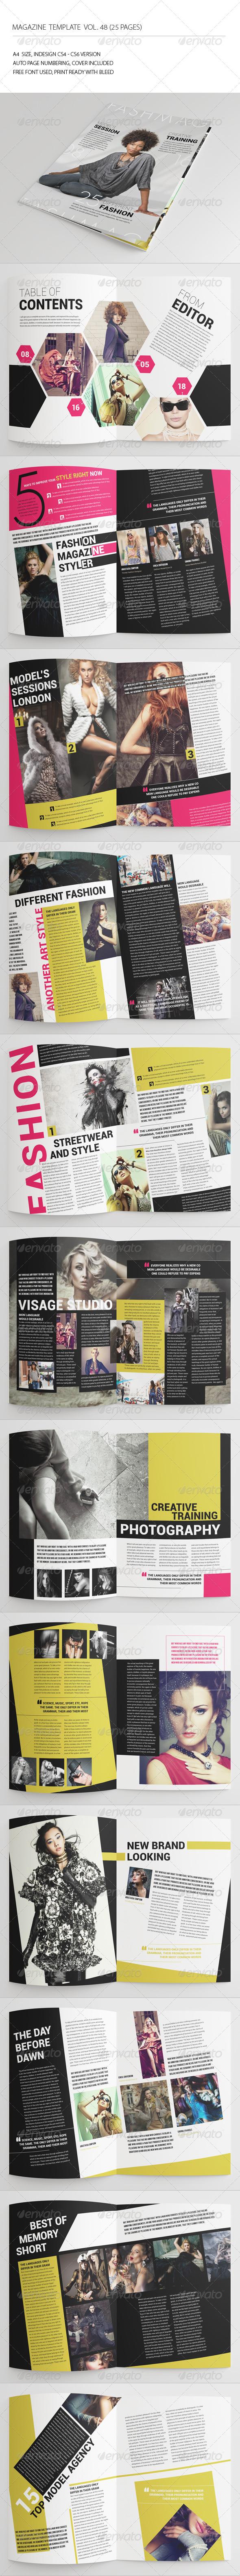 GraphicRiver 25 Pages Fashion Magazine Vol48 7561659